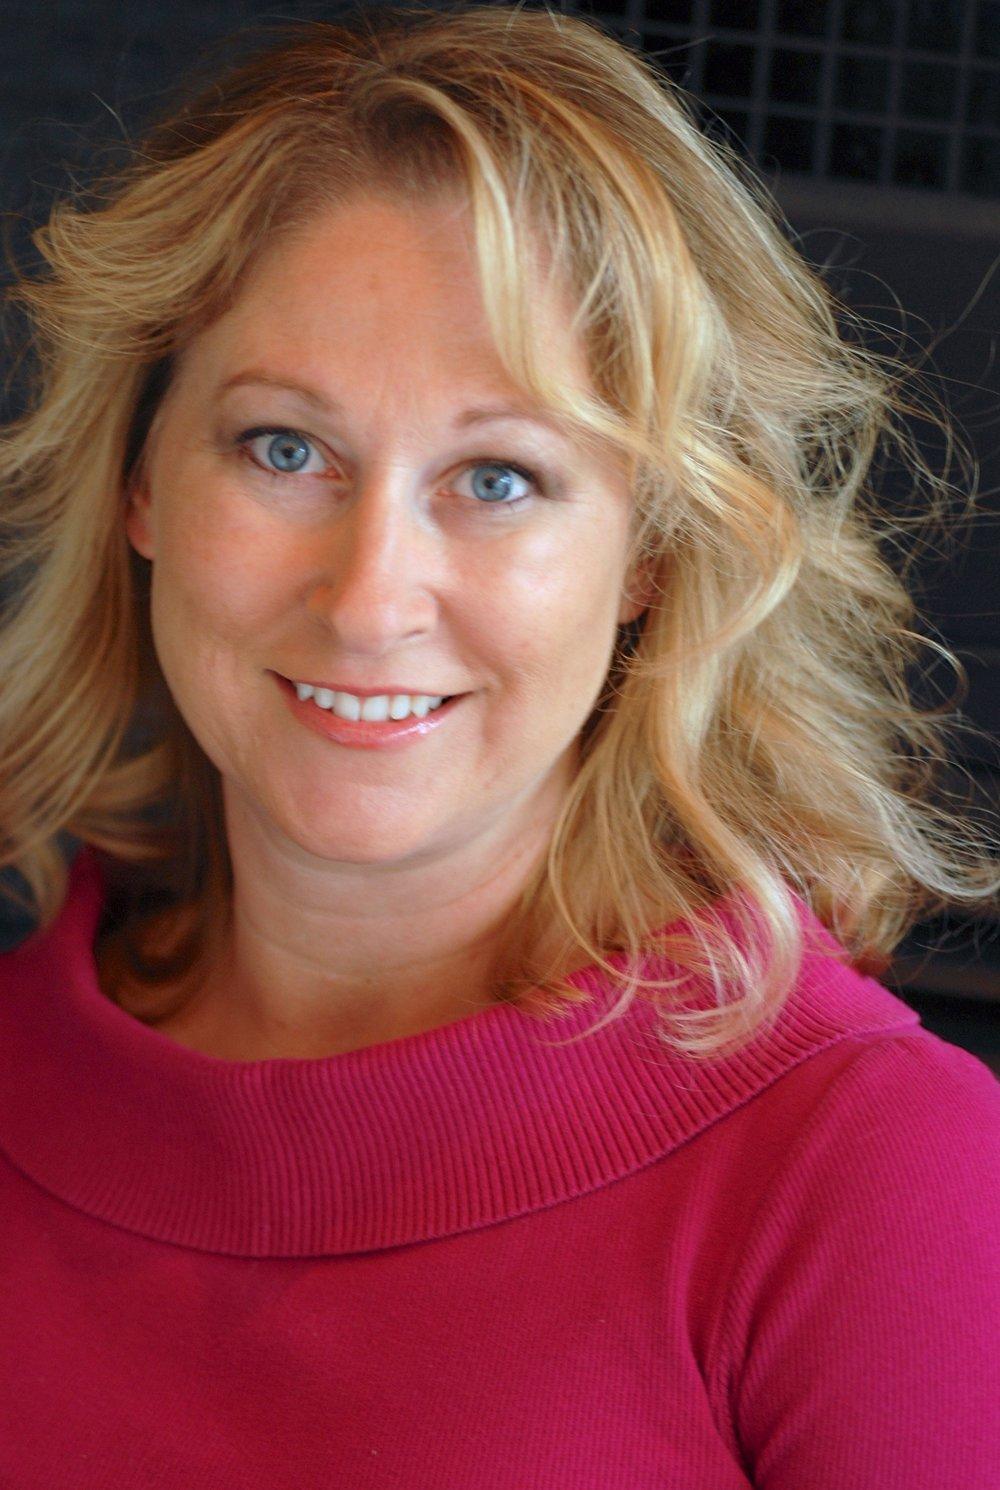 Lori BrownActor, Model - HAIR COLOR:EYE COLOR:HEIGHT:BUST:WAIST:HIPS:DRESS SIZE:SHOE SIZE:LAUNGUAGE(S):UNION: